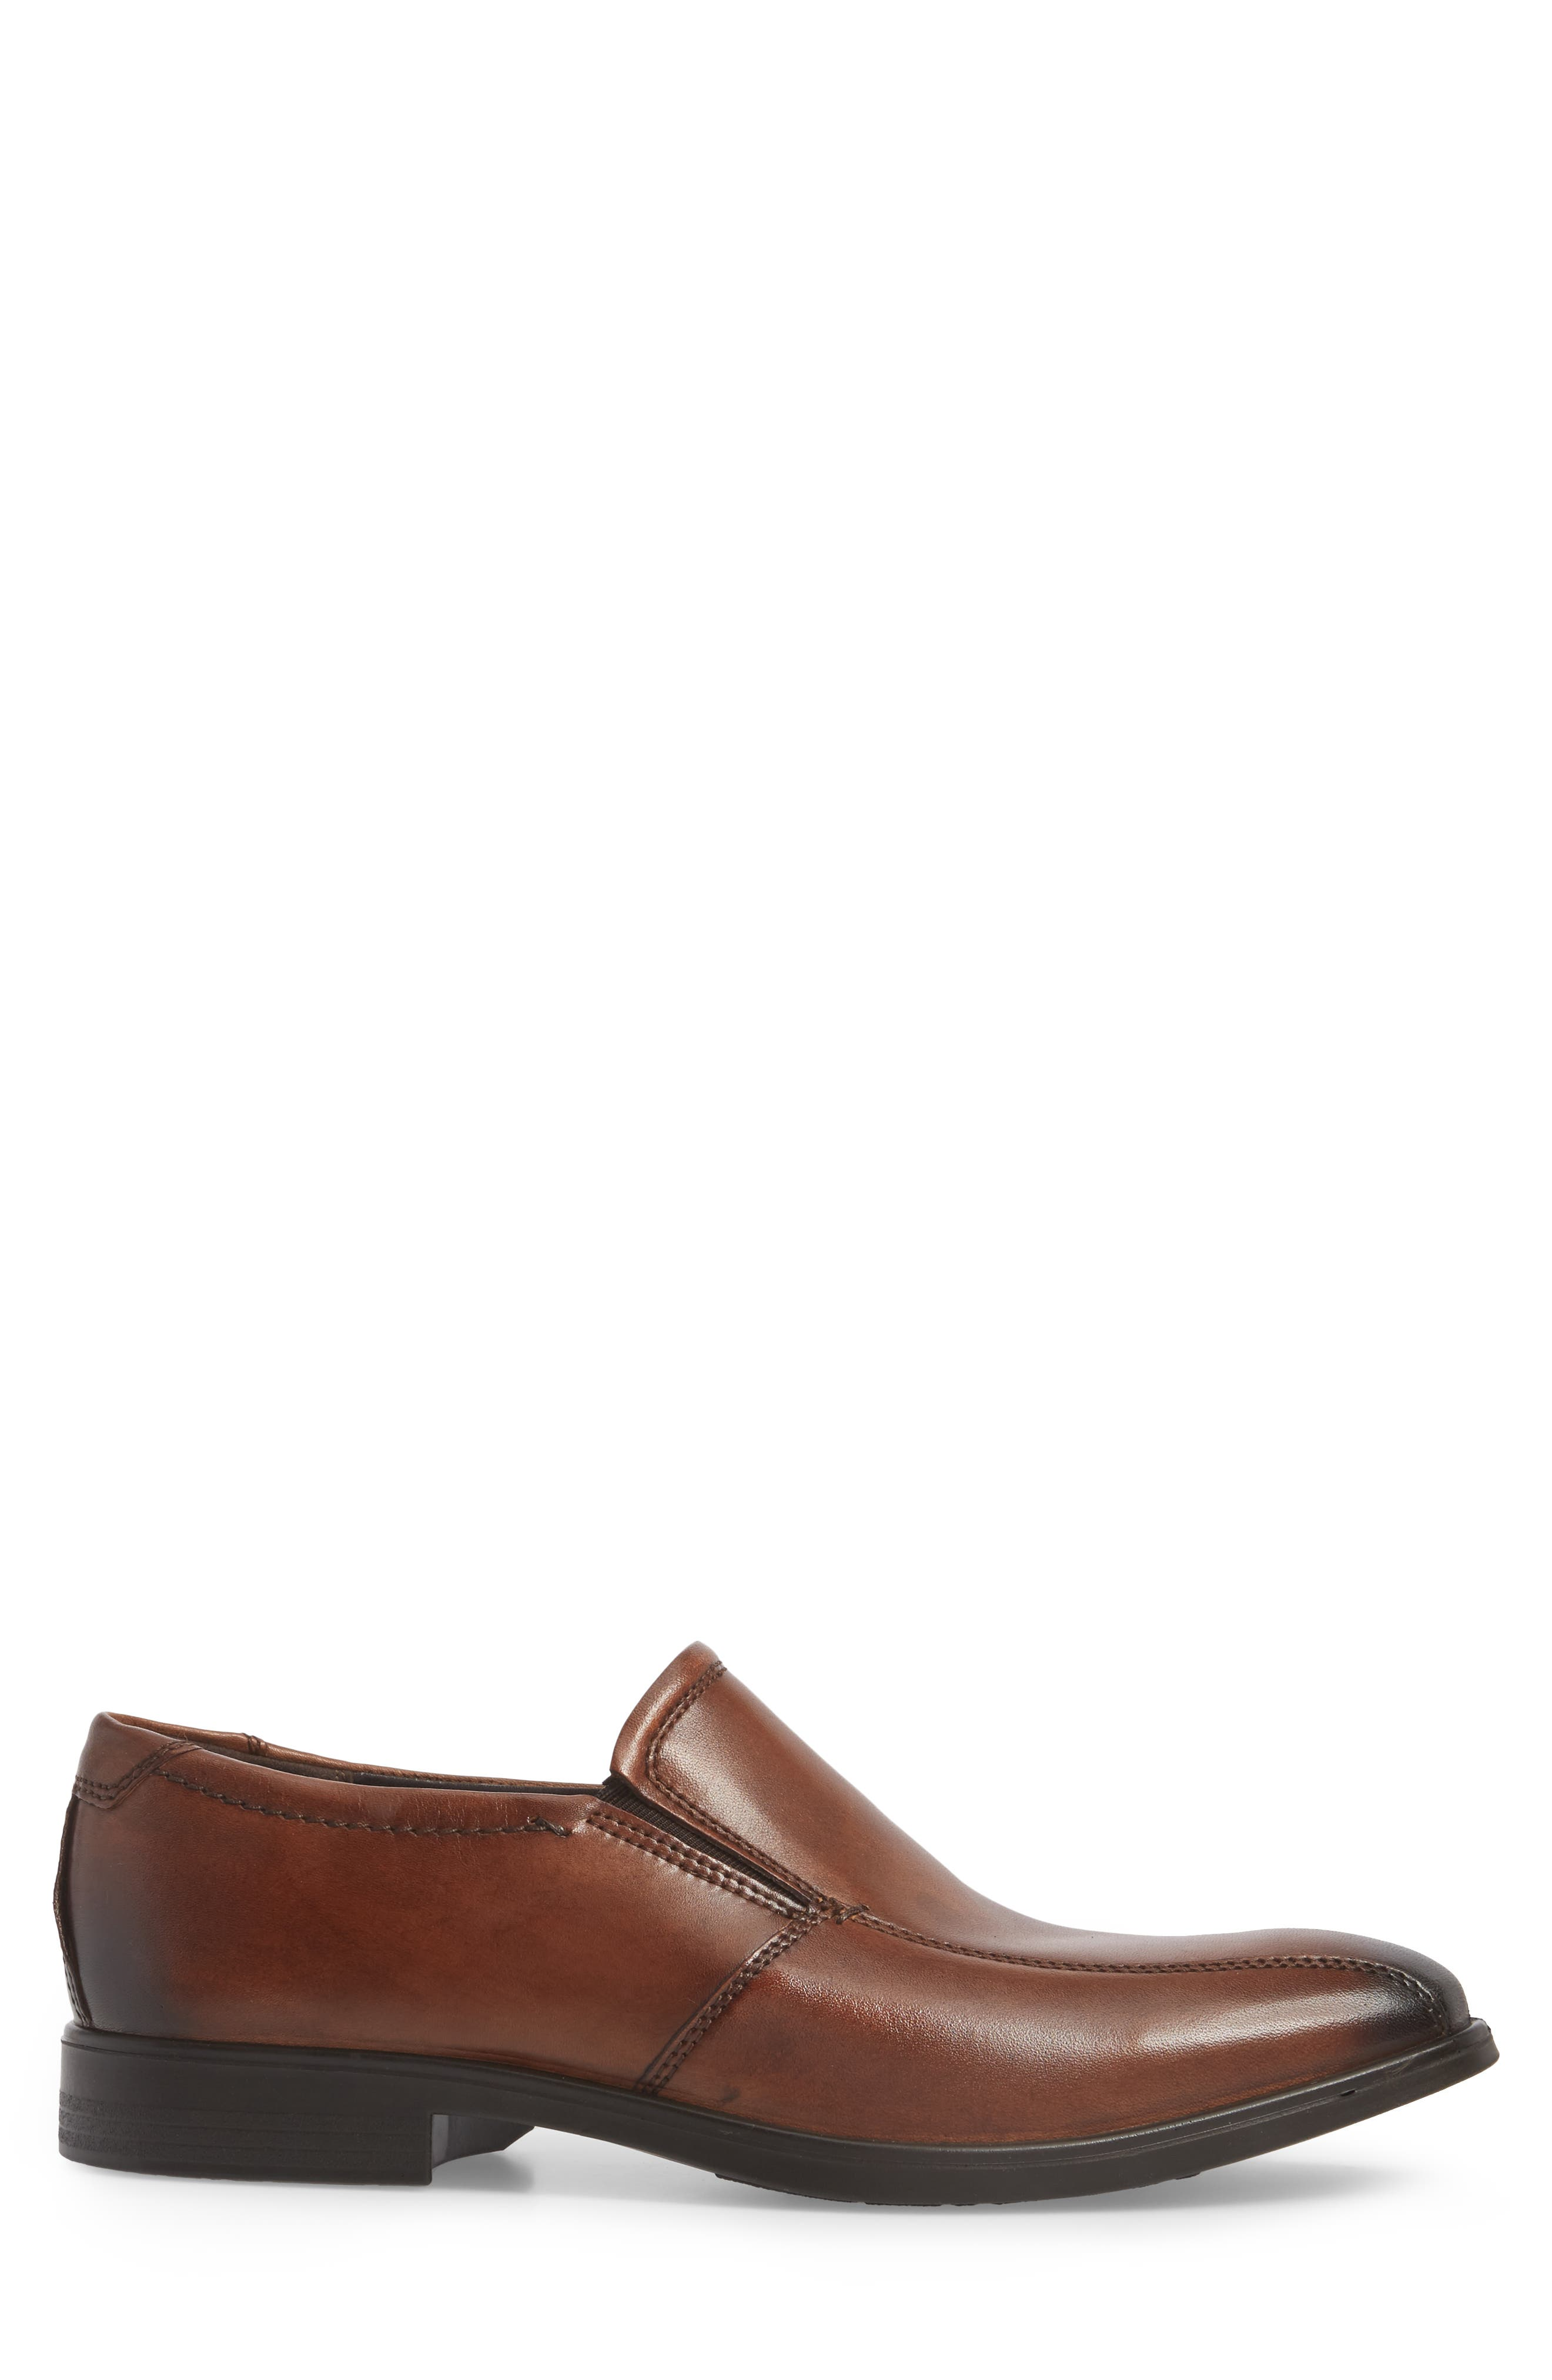 Melbourne Venetian Loafer,                             Alternate thumbnail 3, color,                             Amber Leather